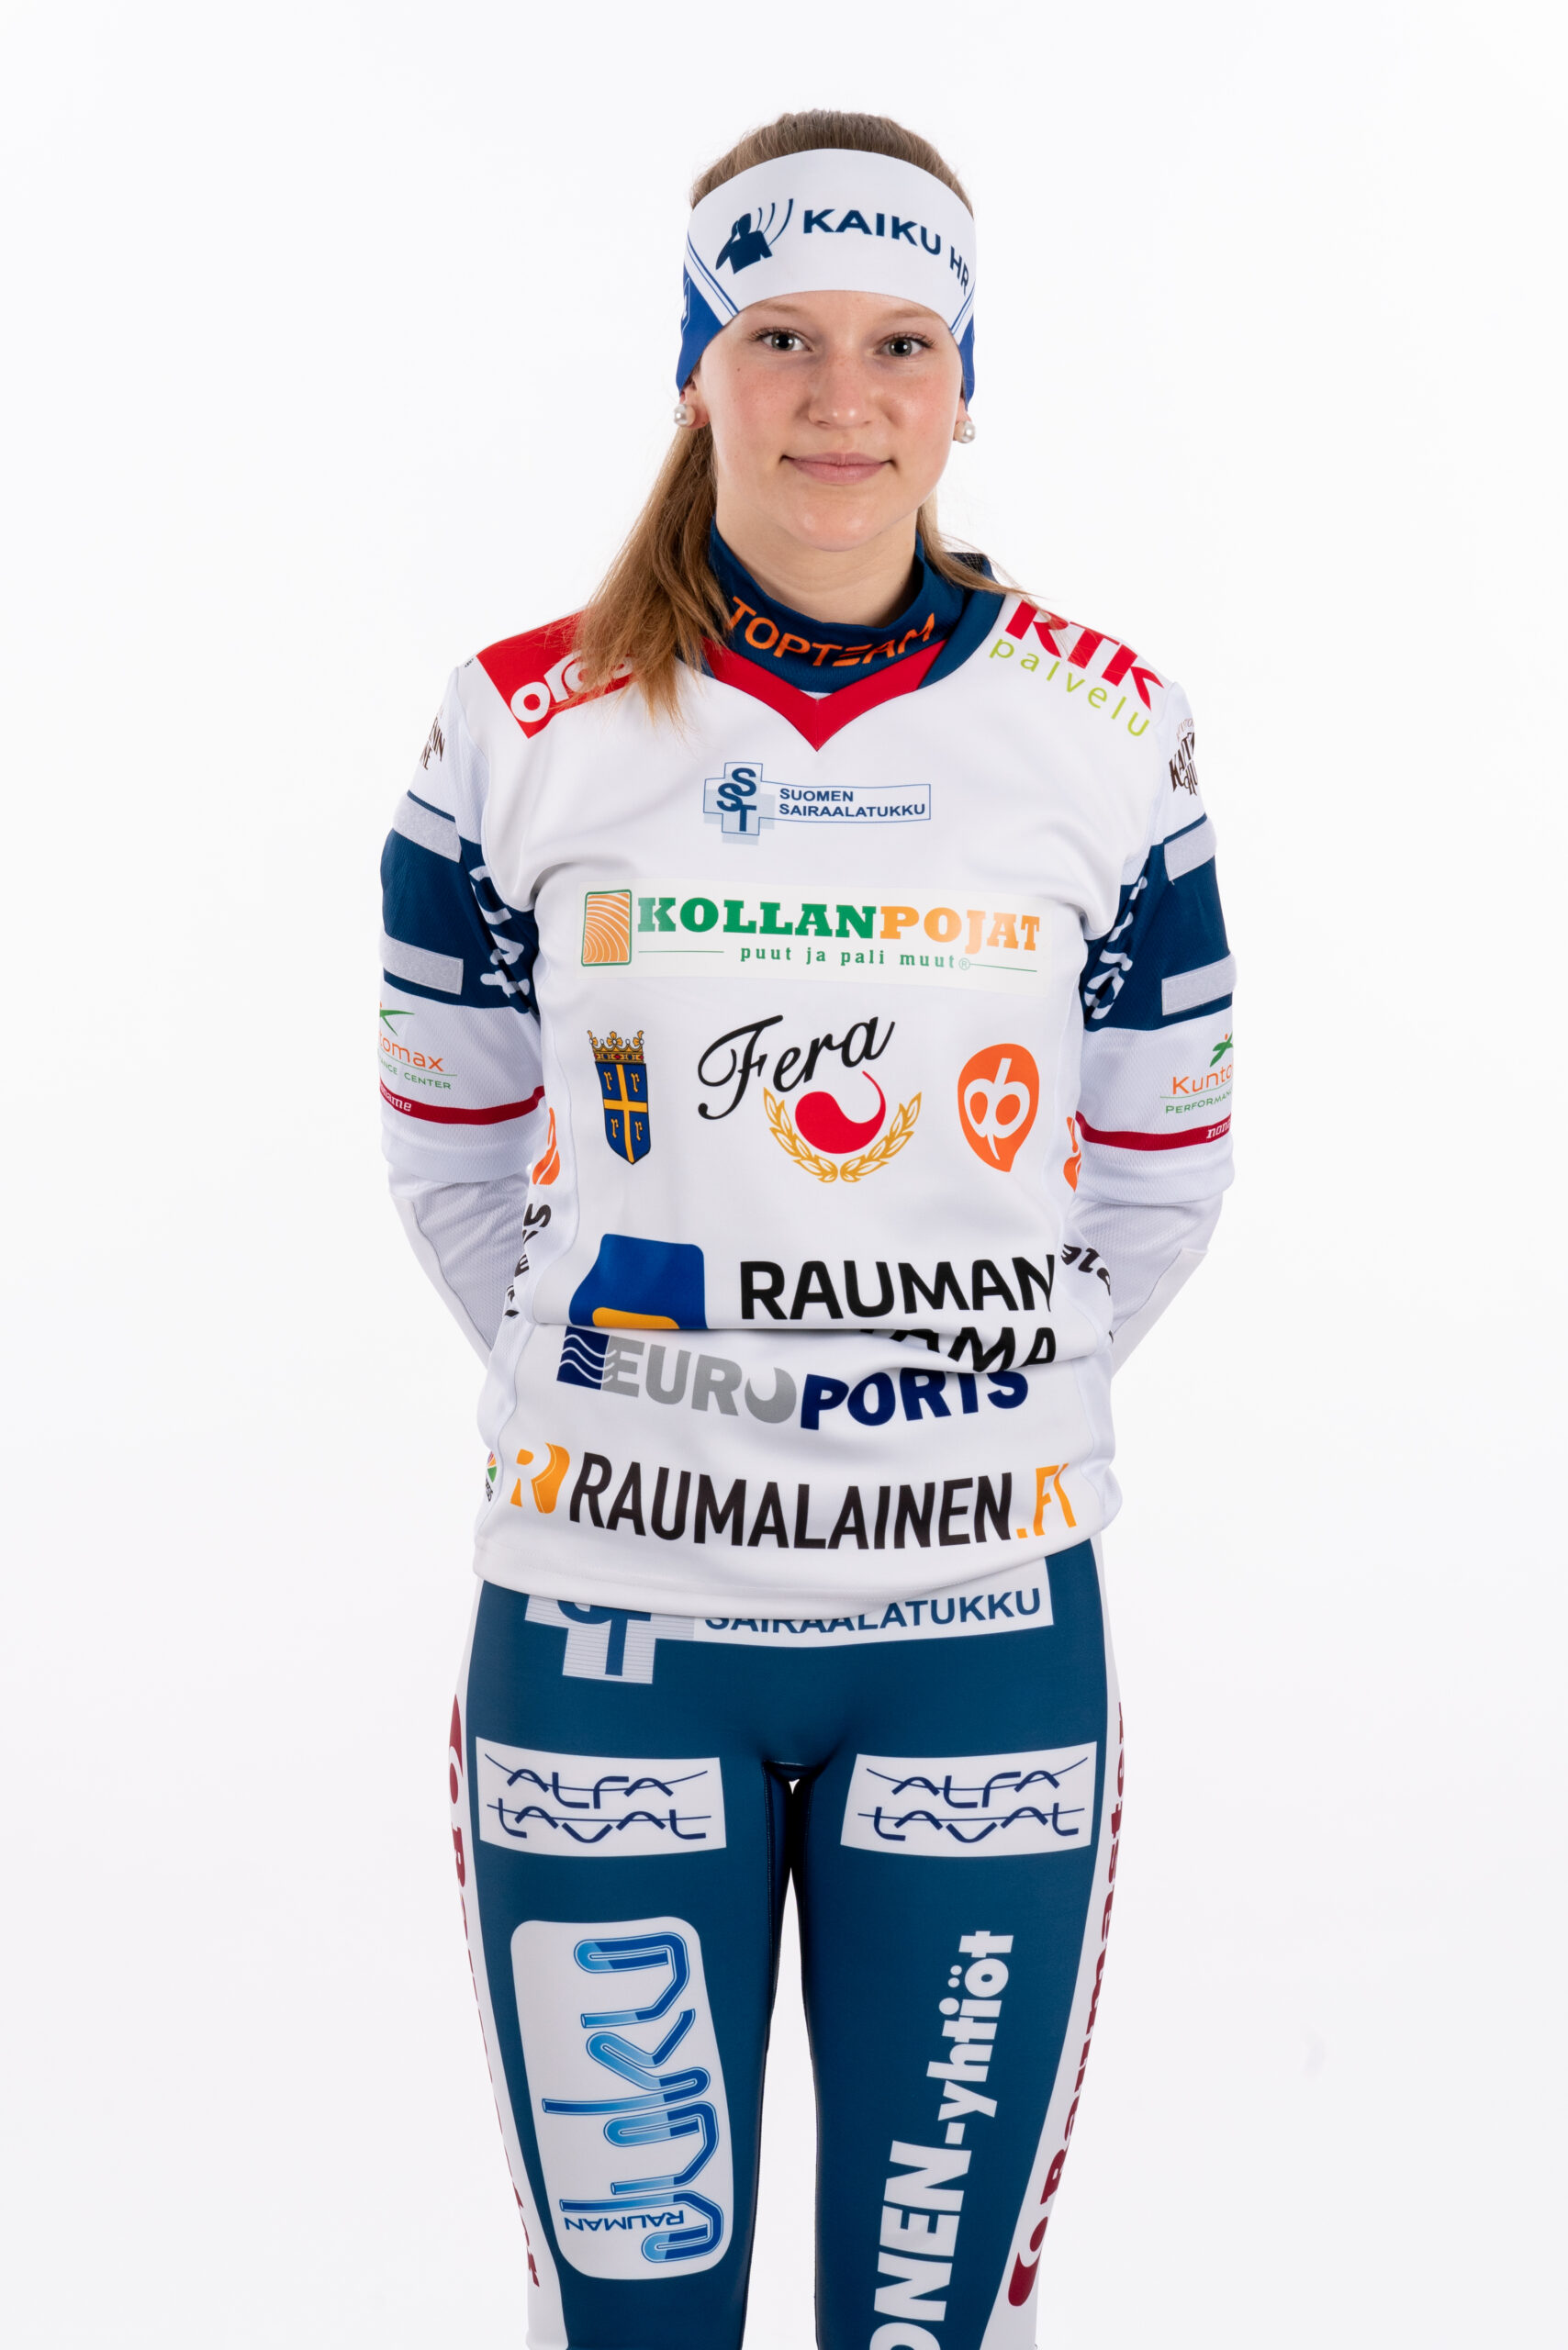 Hulda Alanen